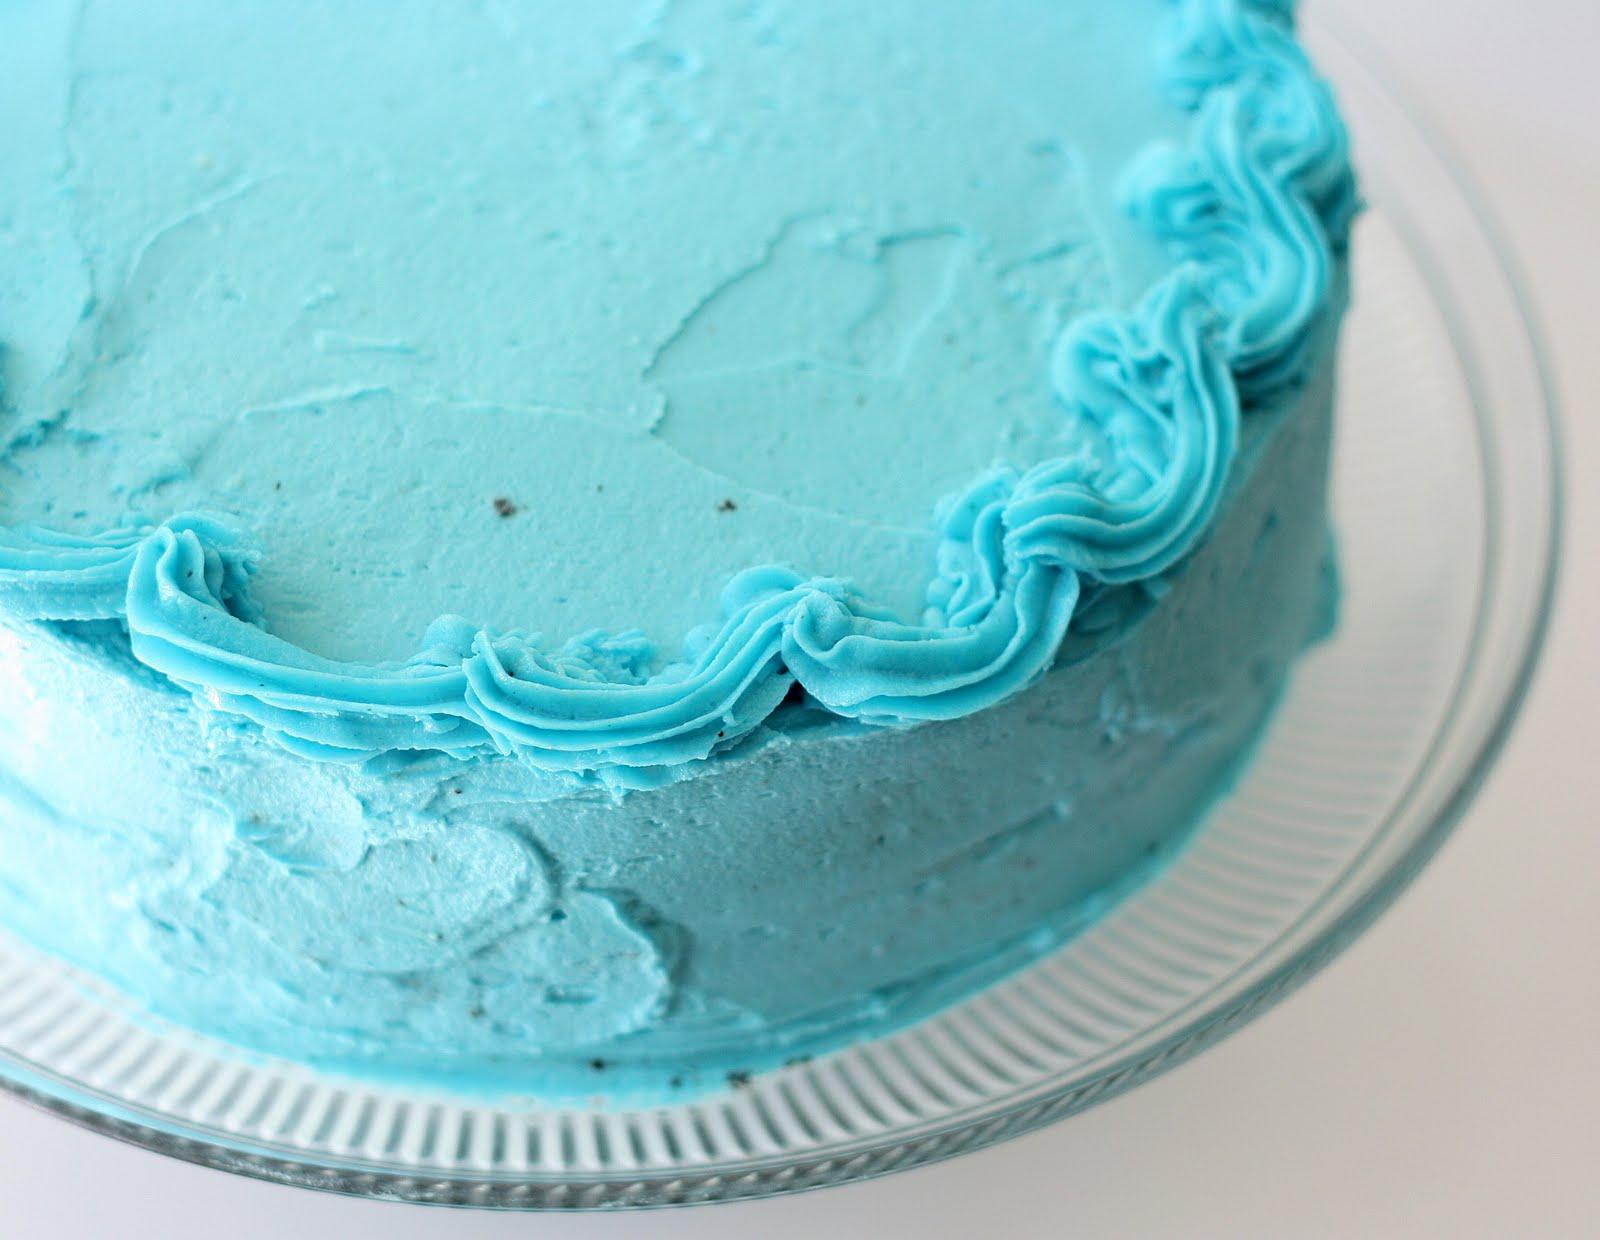 Mangio Da Sola Baby Blue Cake Chocolate And White Cake